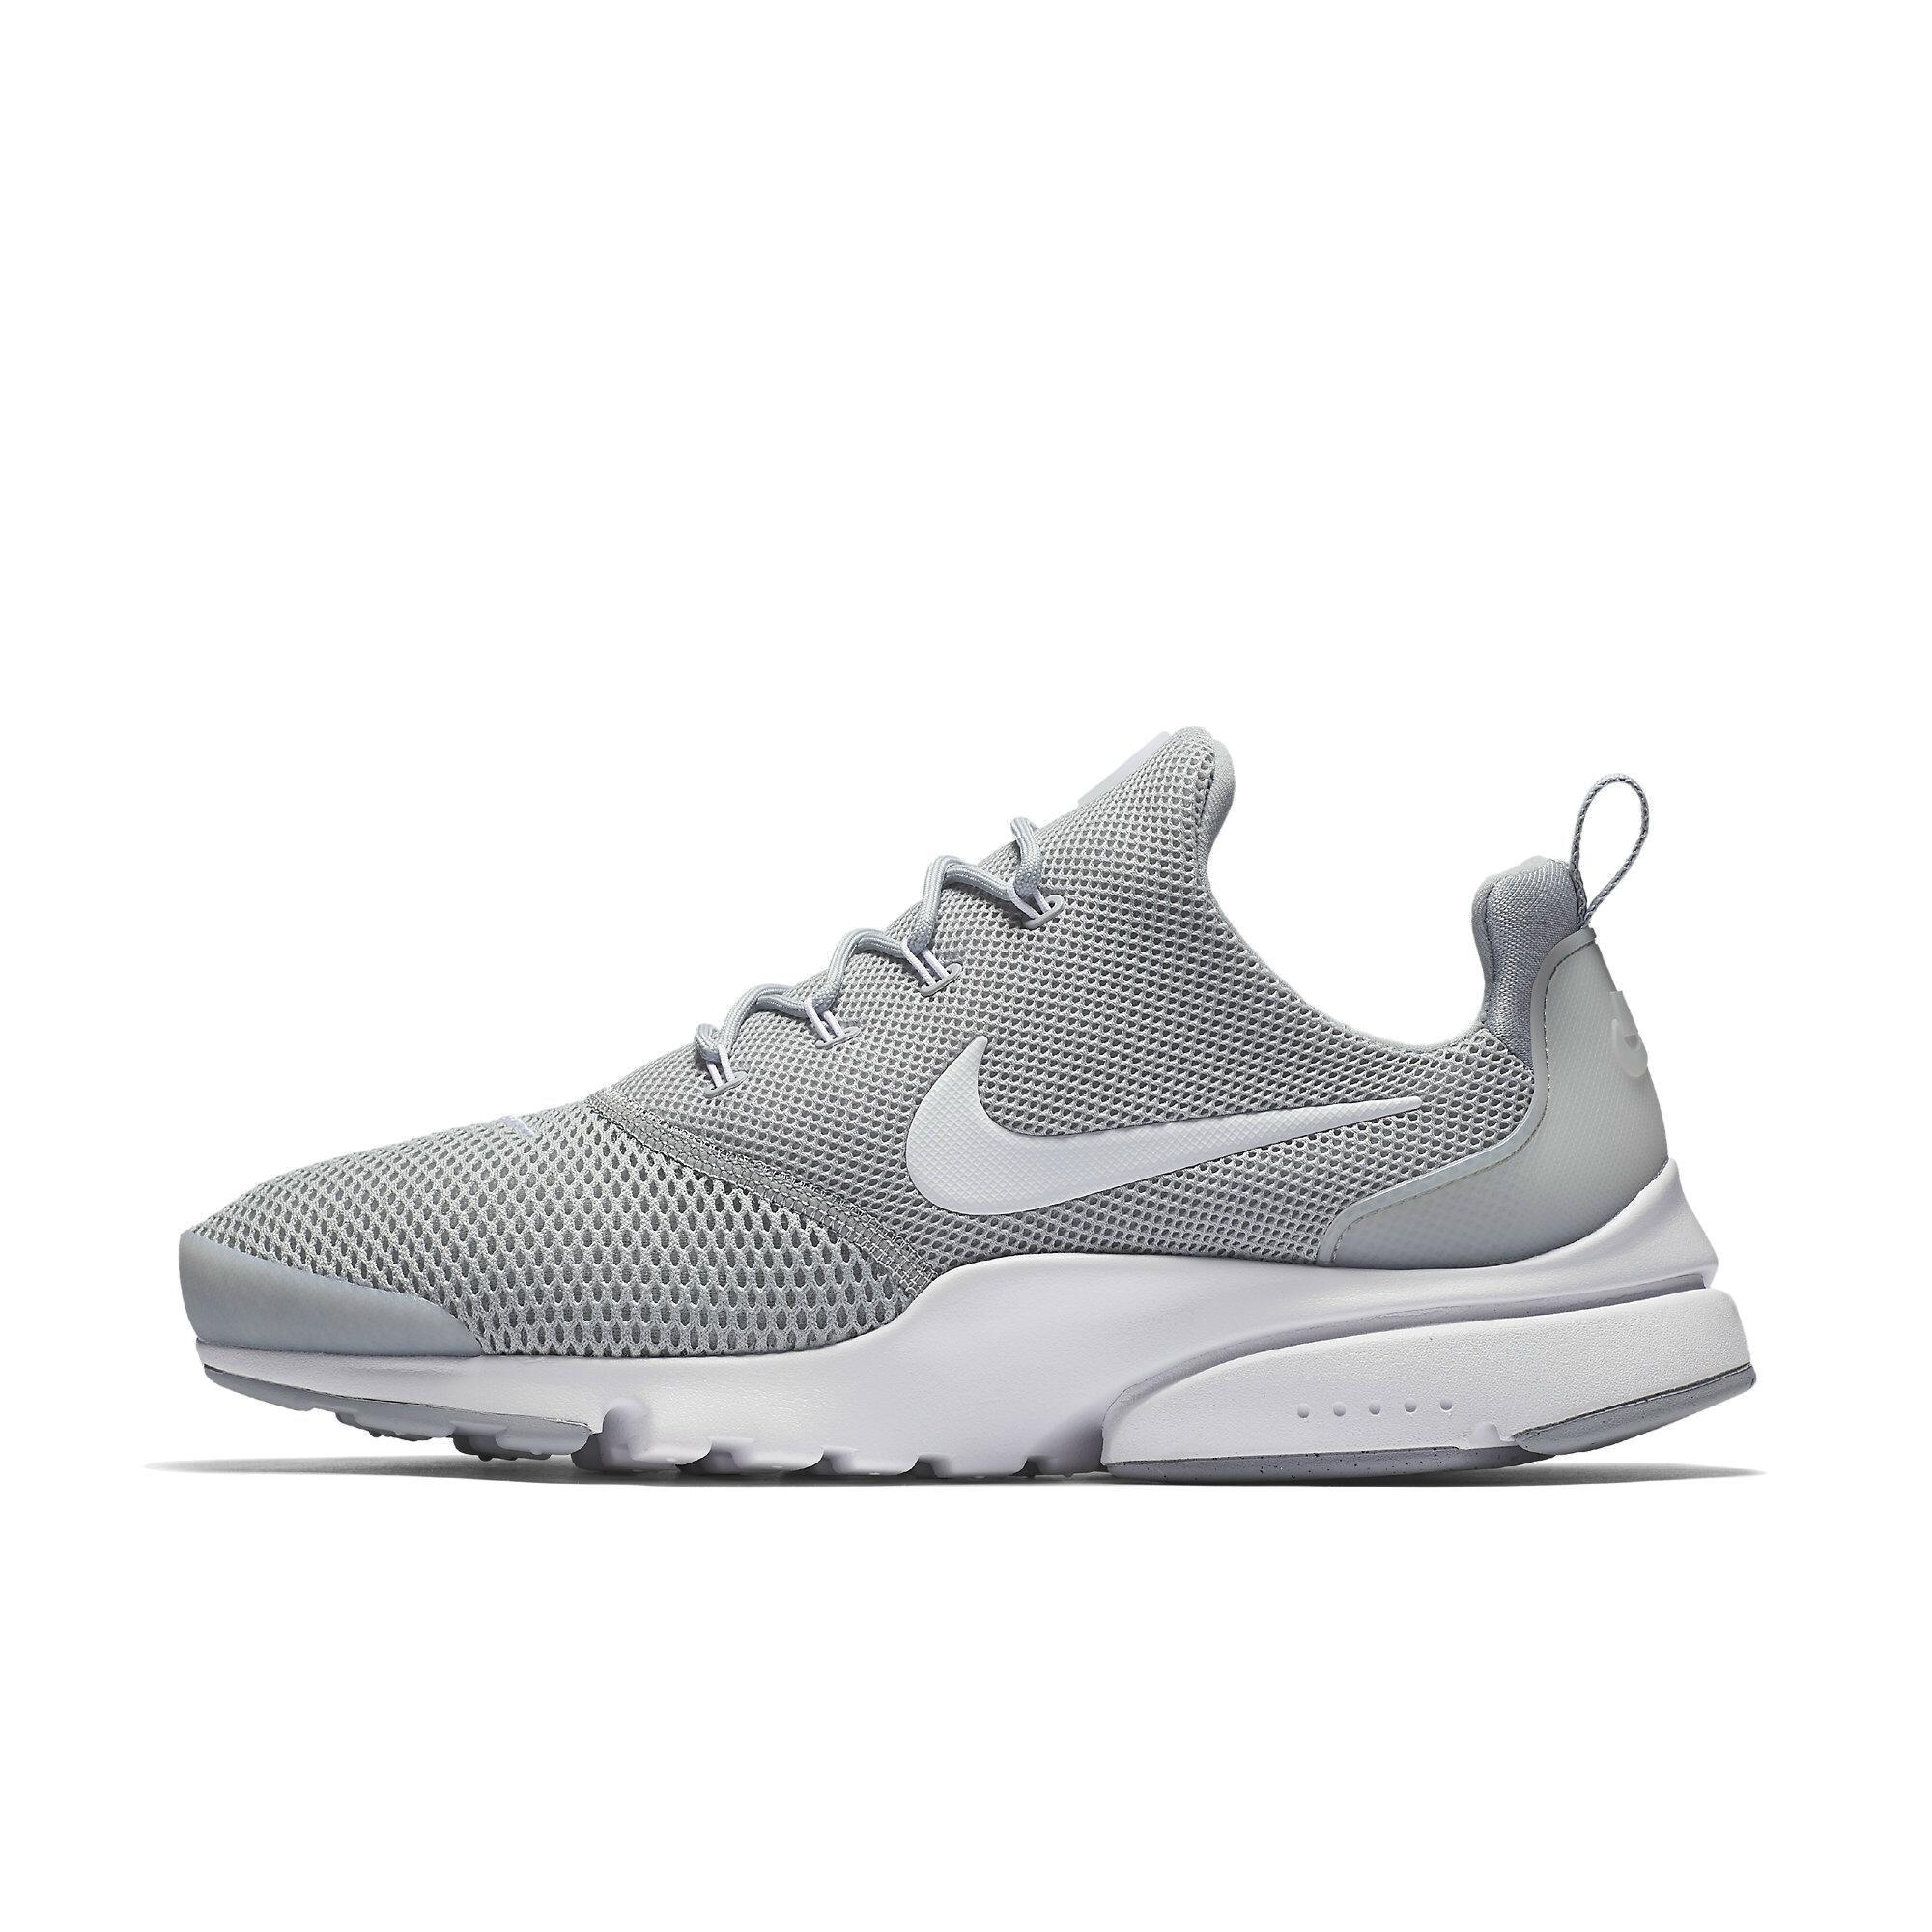 71259524a58dd Nike New Men's Presto Fly Running Sneaker (9, Wolf Grey)